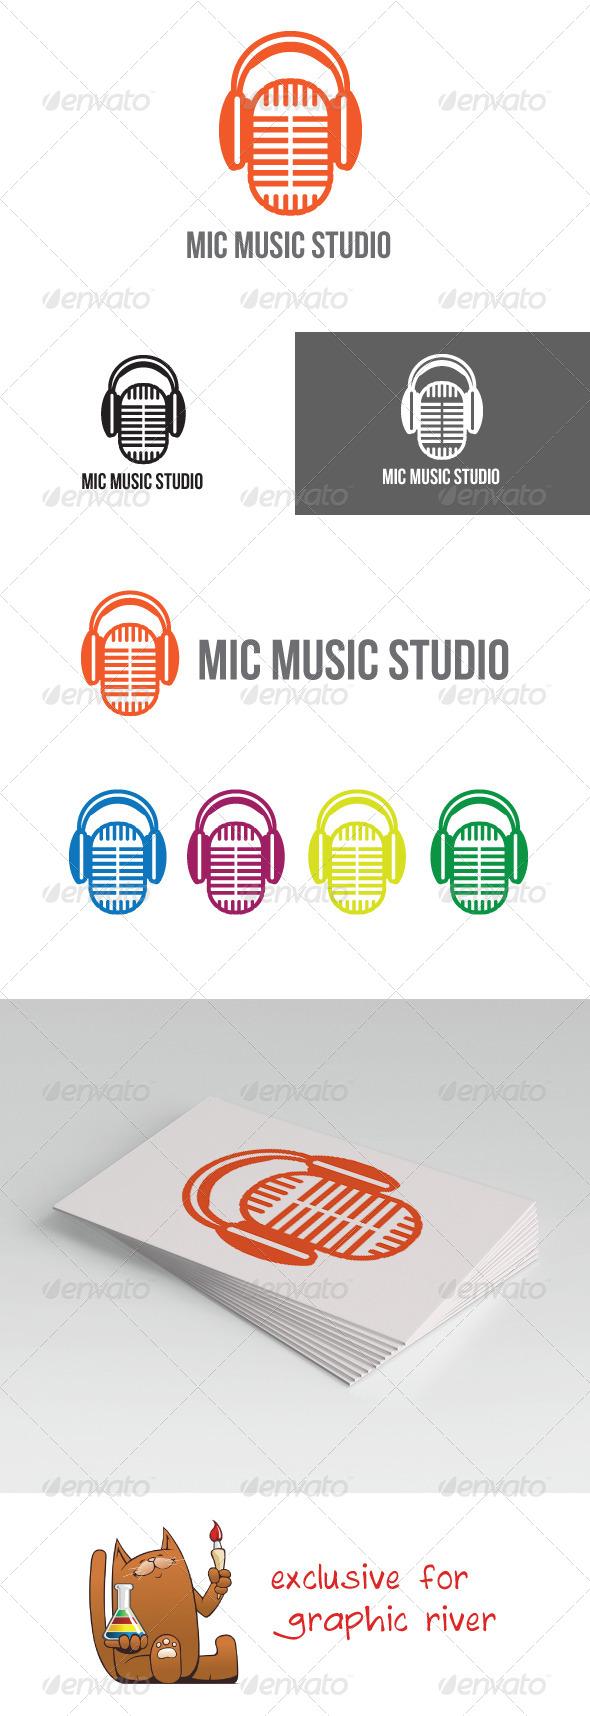 GraphicRiver Mic Music Studio Logo 5739645